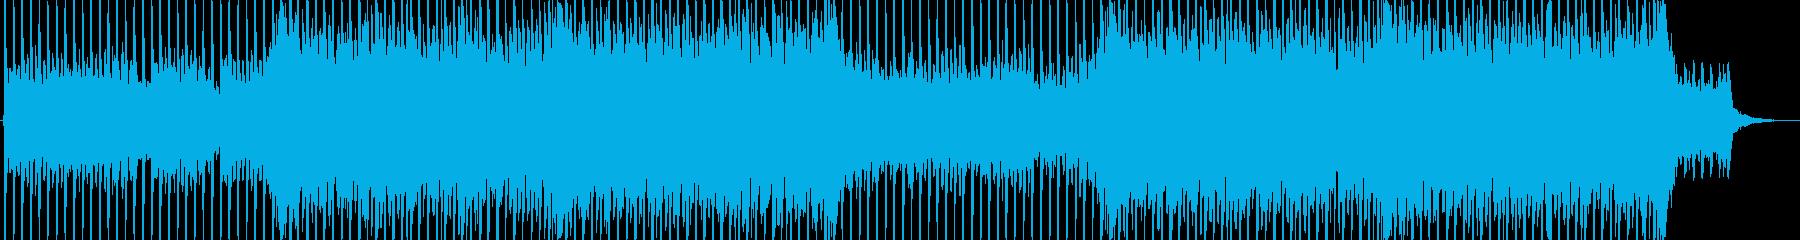 Corporate Orchestraの再生済みの波形